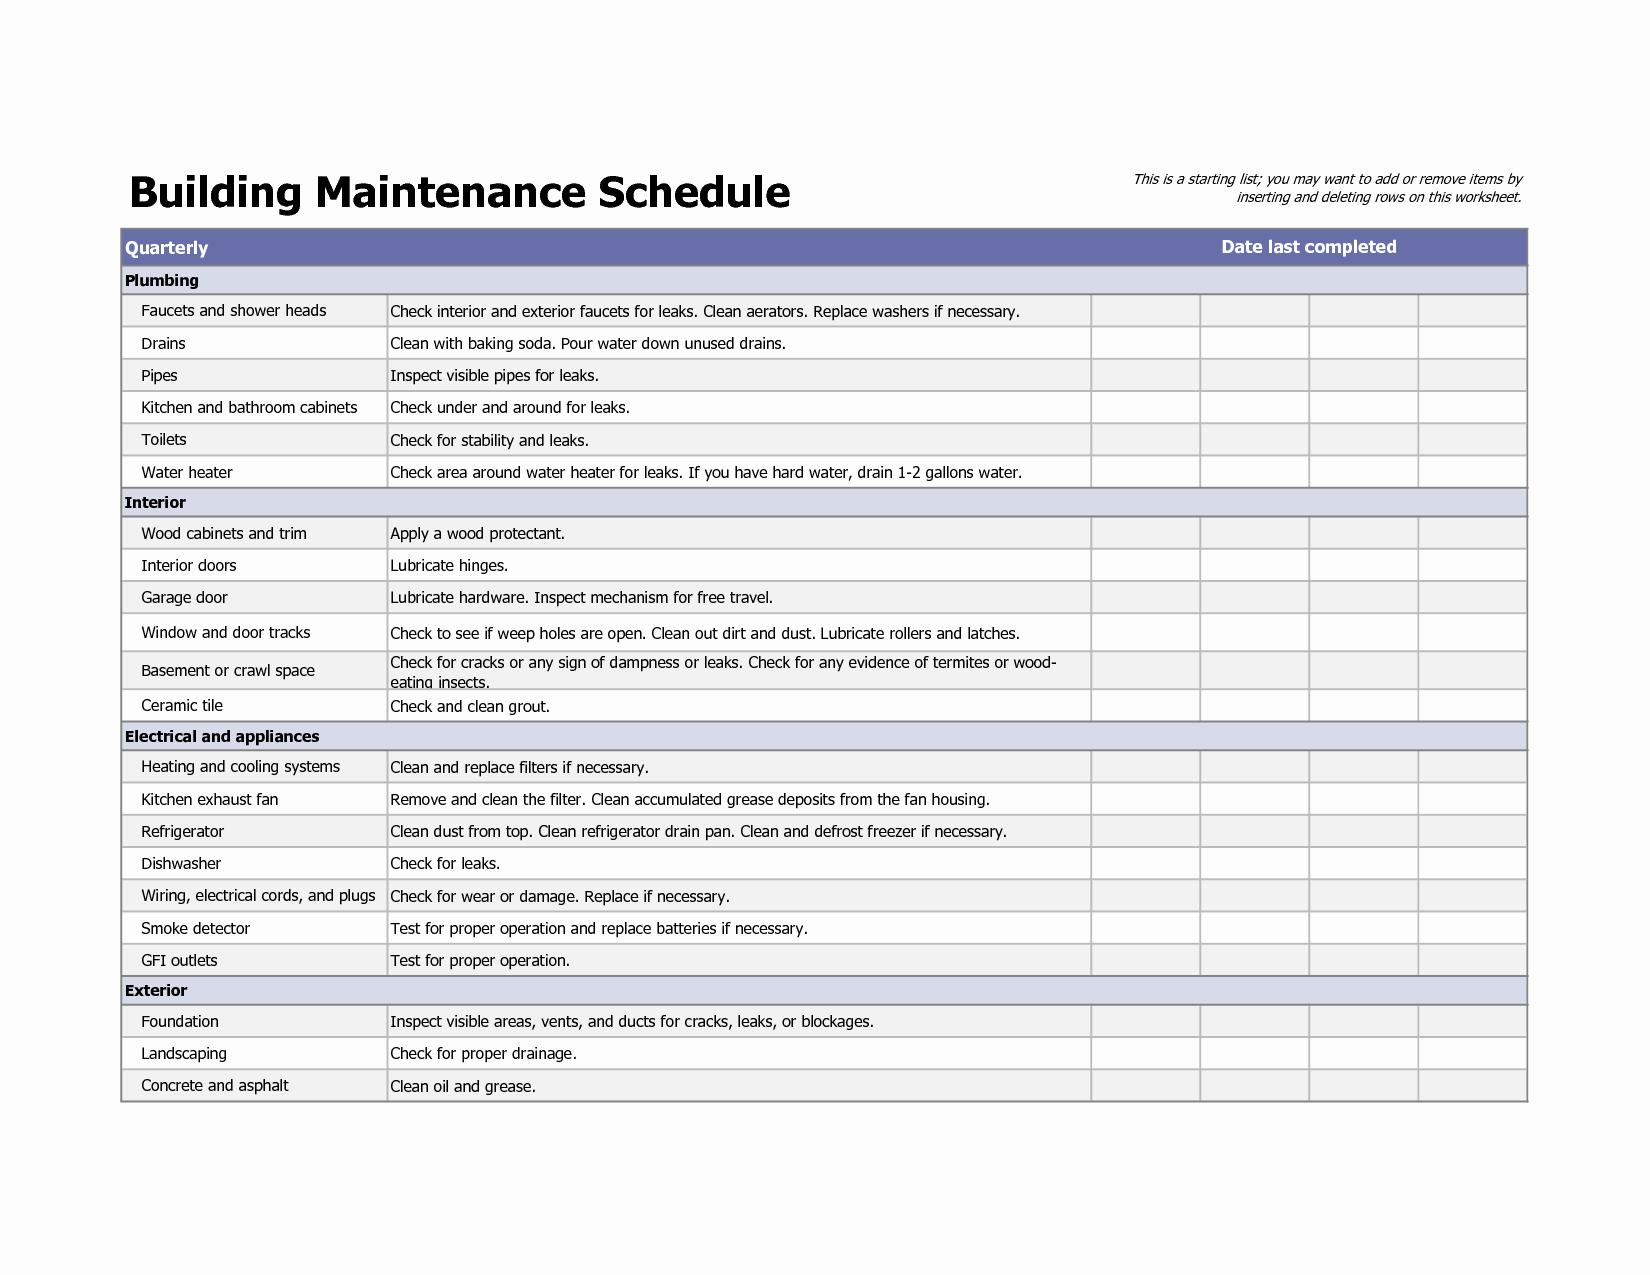 Equipment Maintenance Log Template Excel Fresh Equipment Maintenance Schedule Template Excel